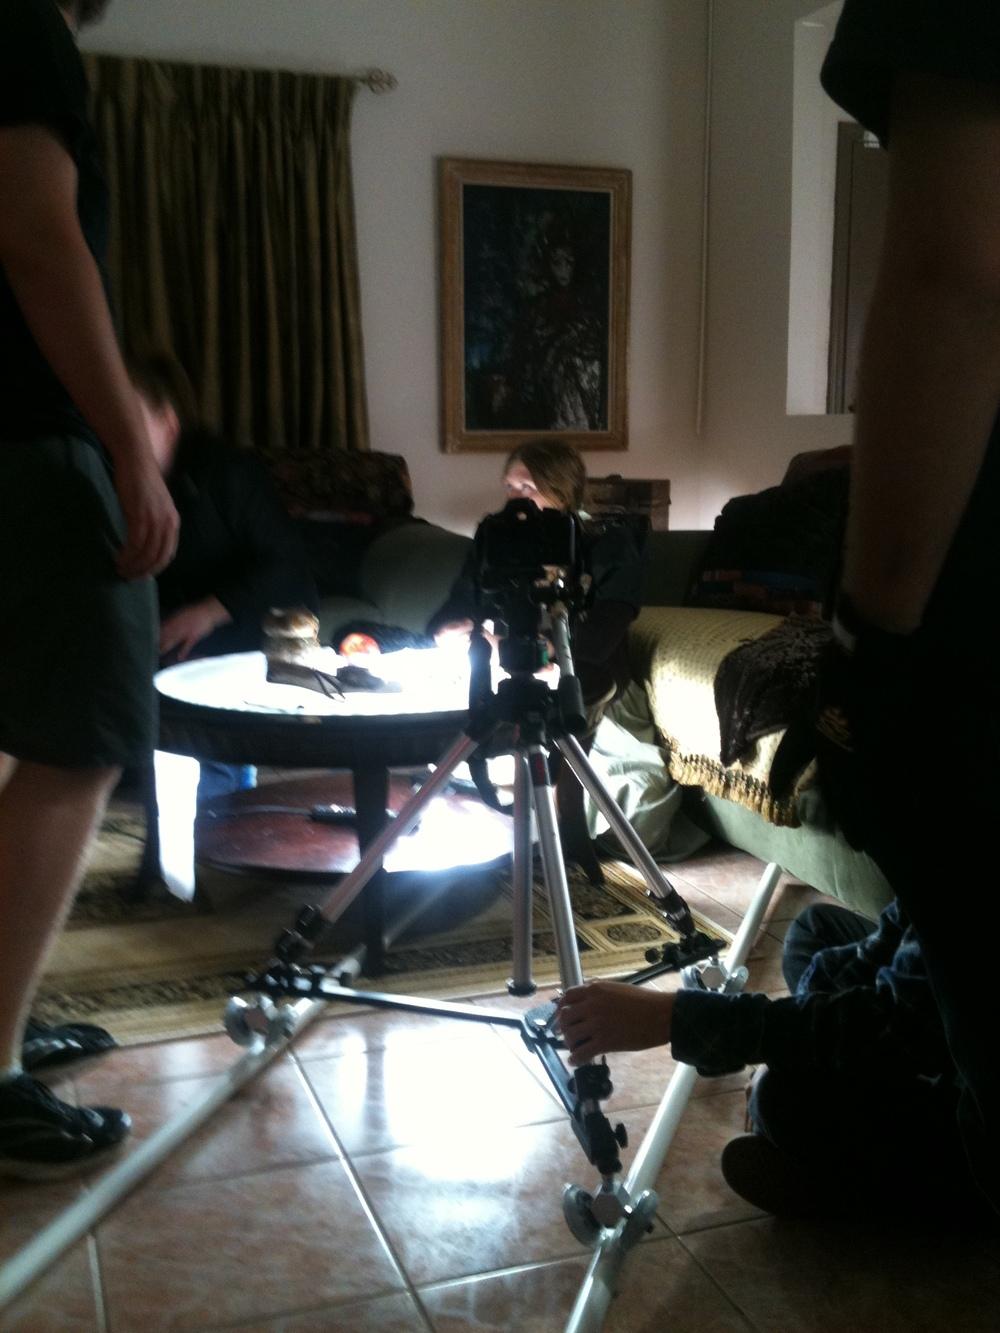 Kubrick Table and Camera